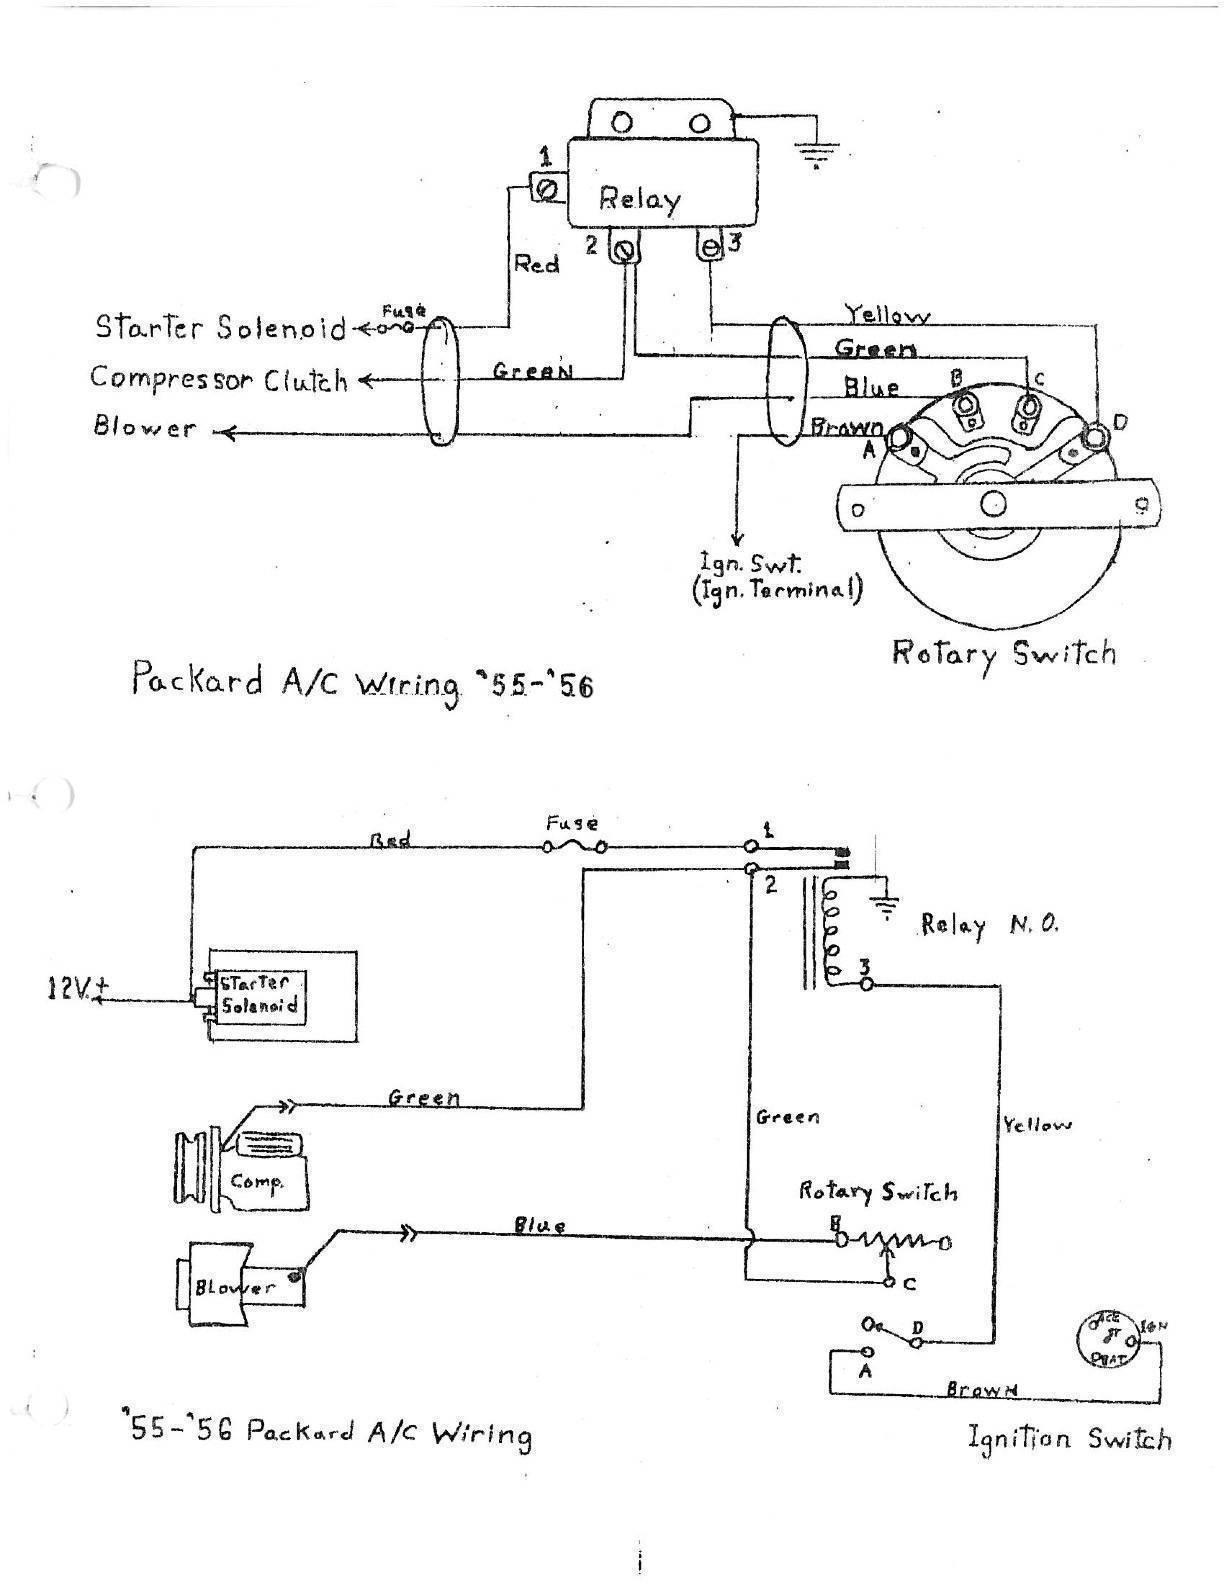 Packard Motor Car Information - Wiring Diagrams  C